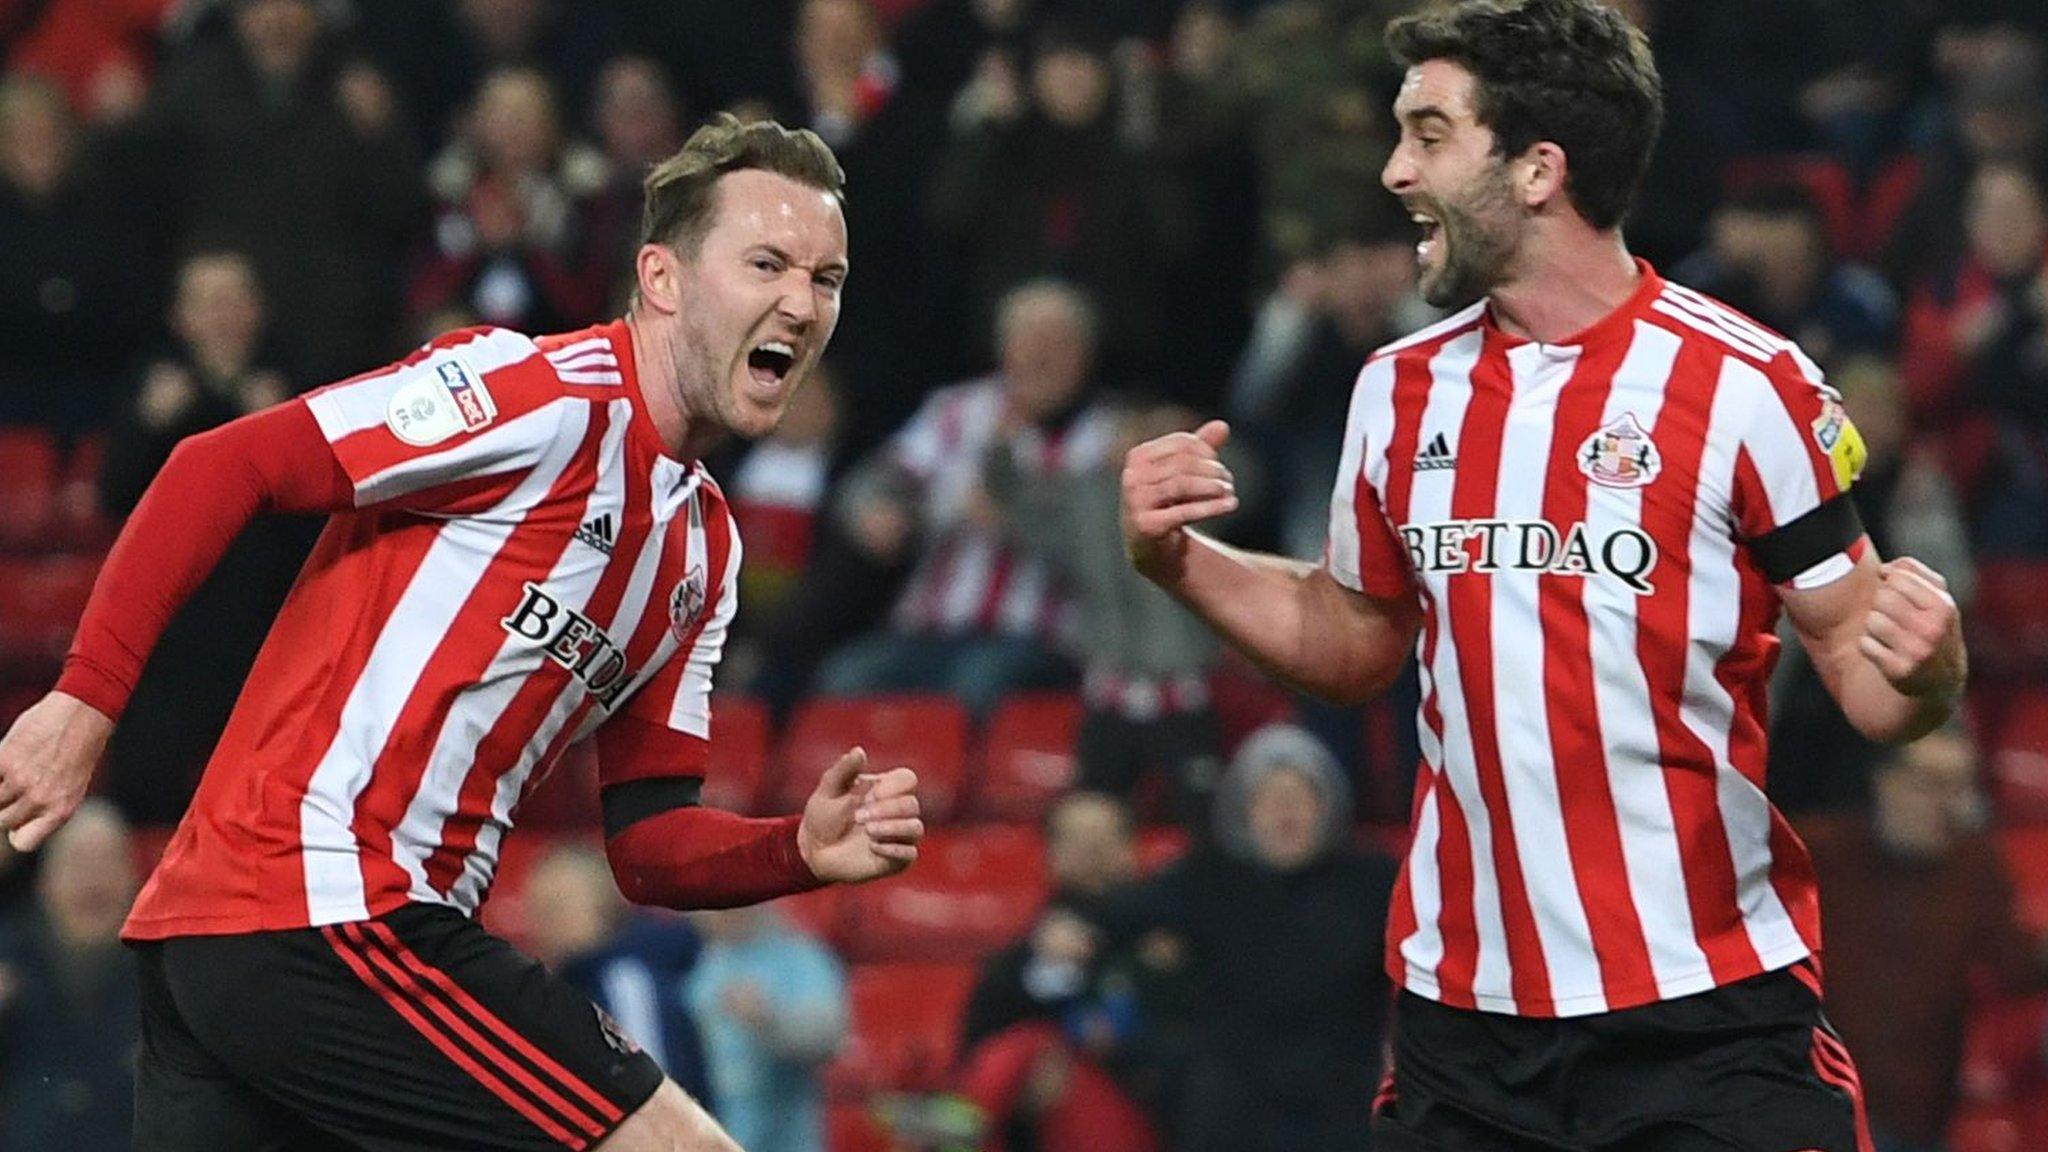 Sunderland 2-2 Accrington Stanley